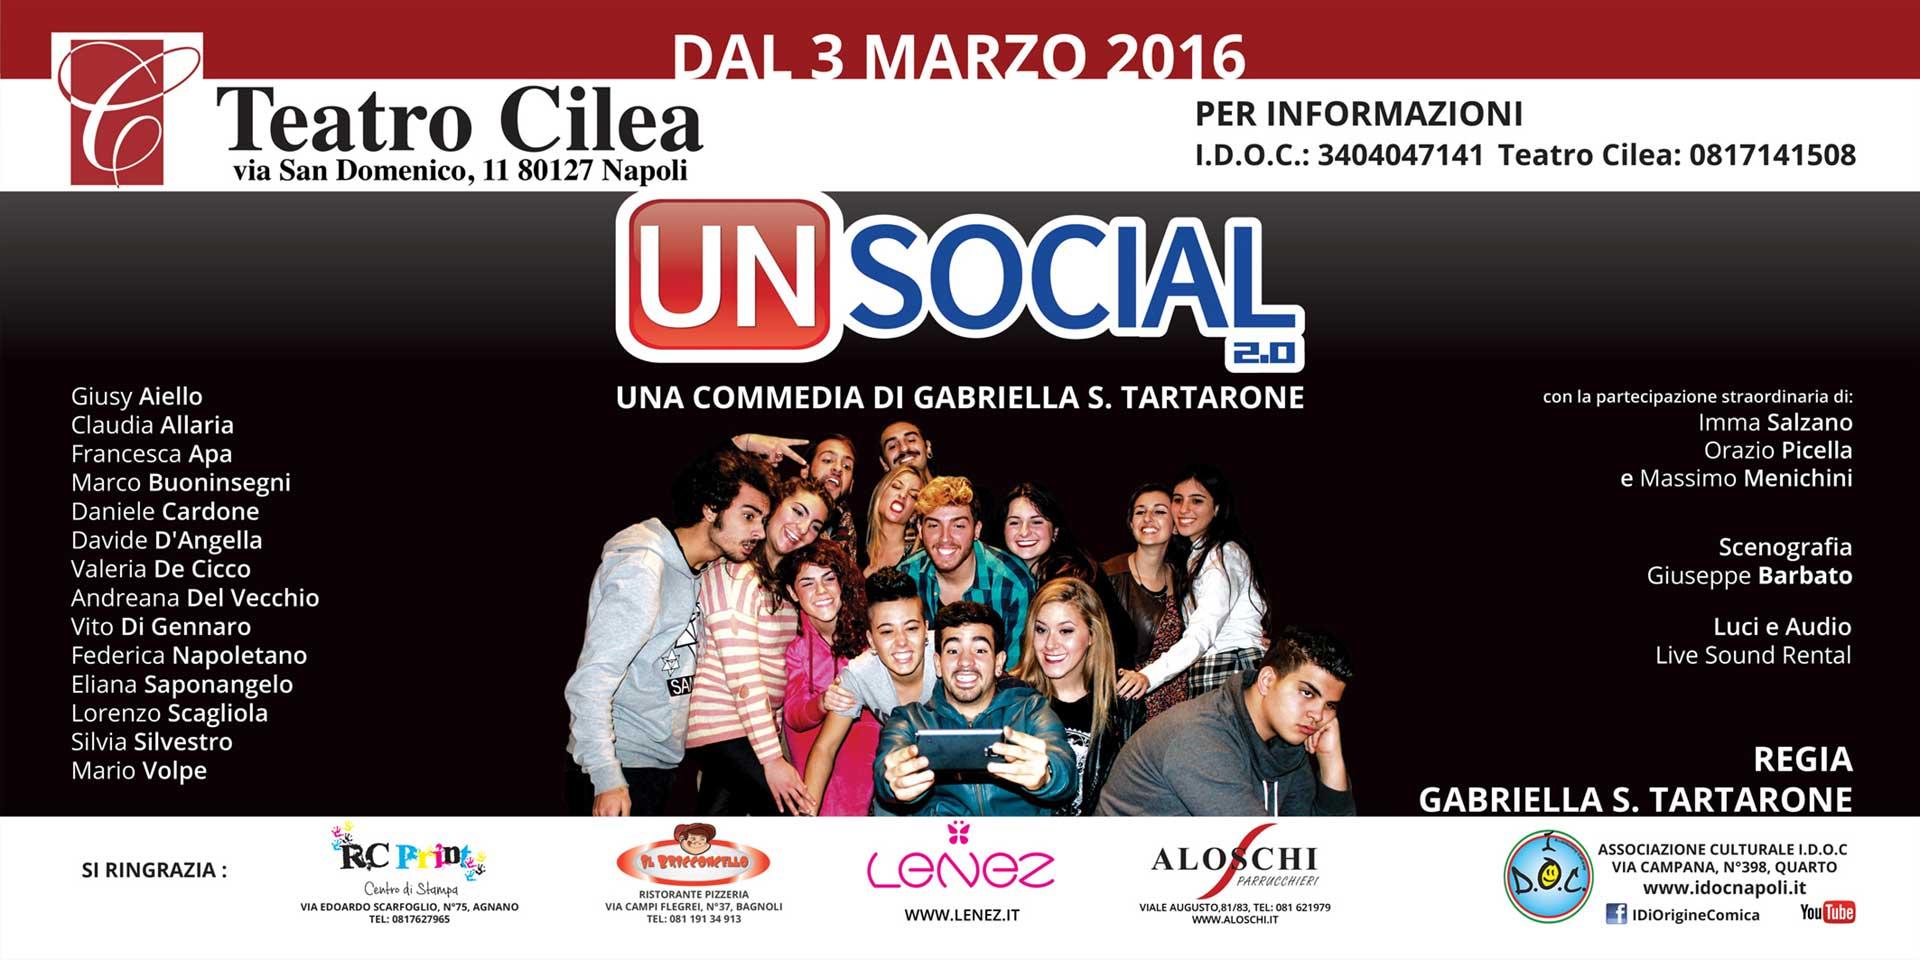 unsocial 2.0